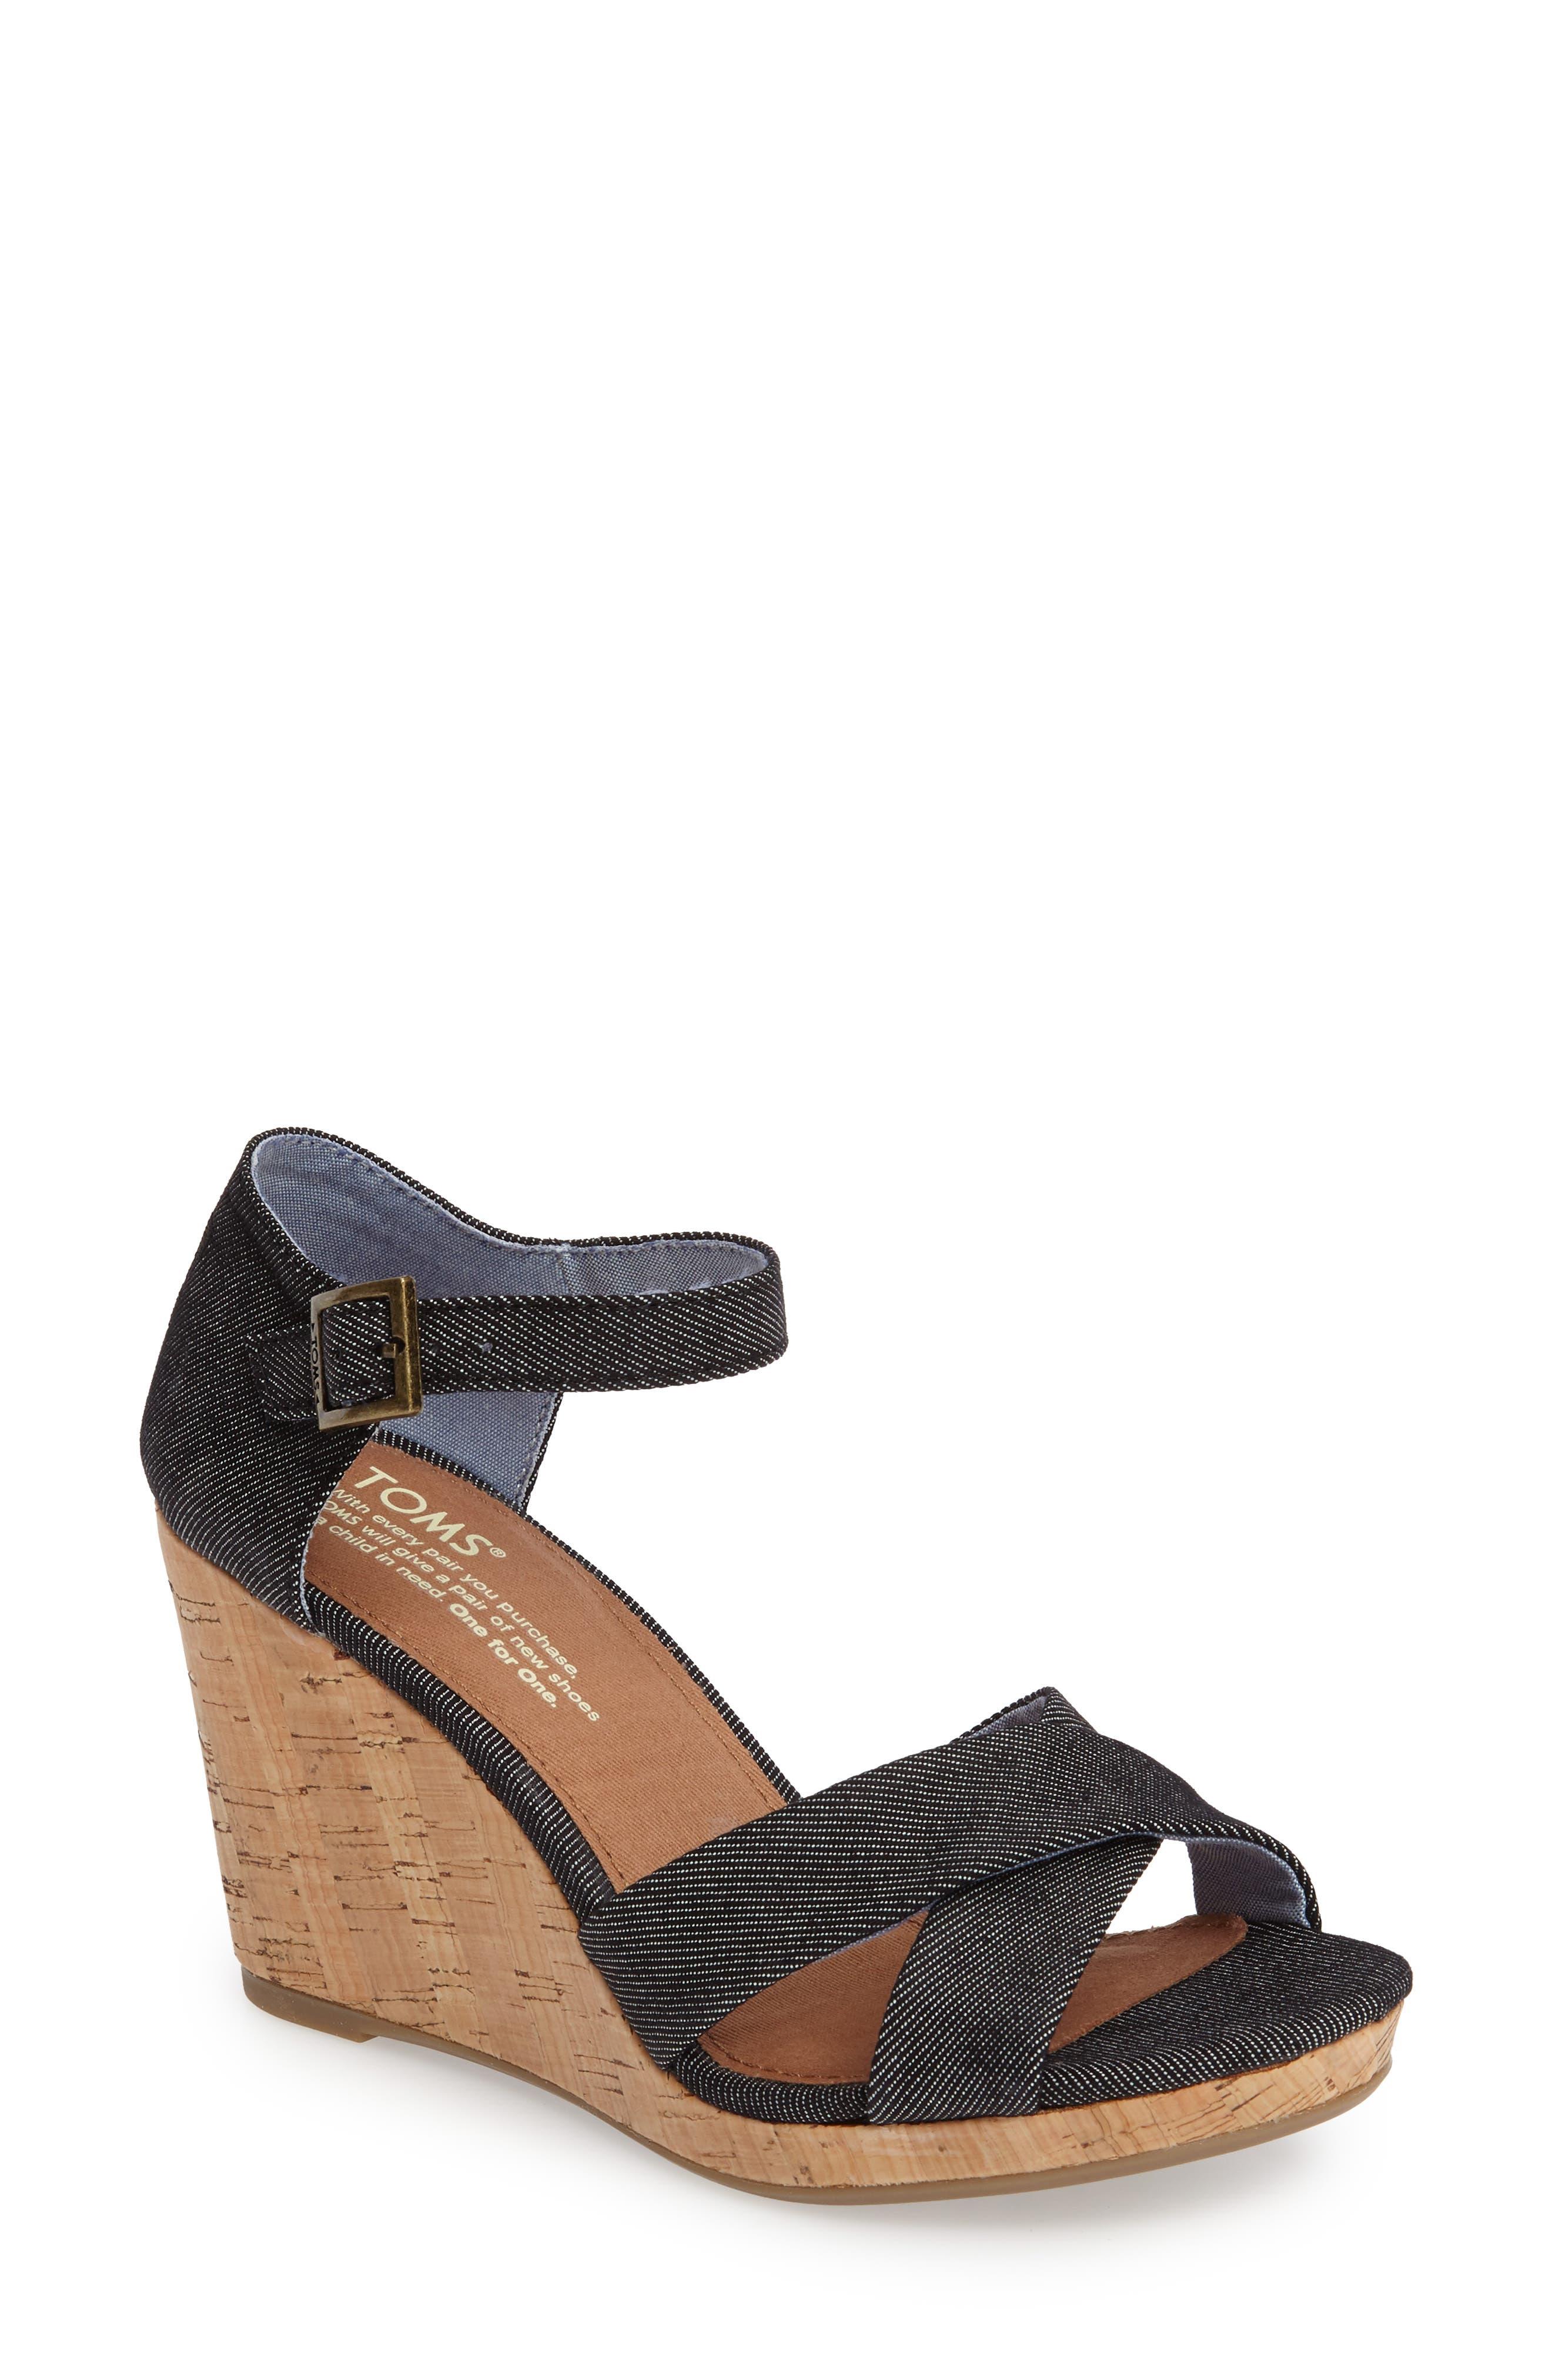 Sienna Wedge Sandal, Main, color, 001